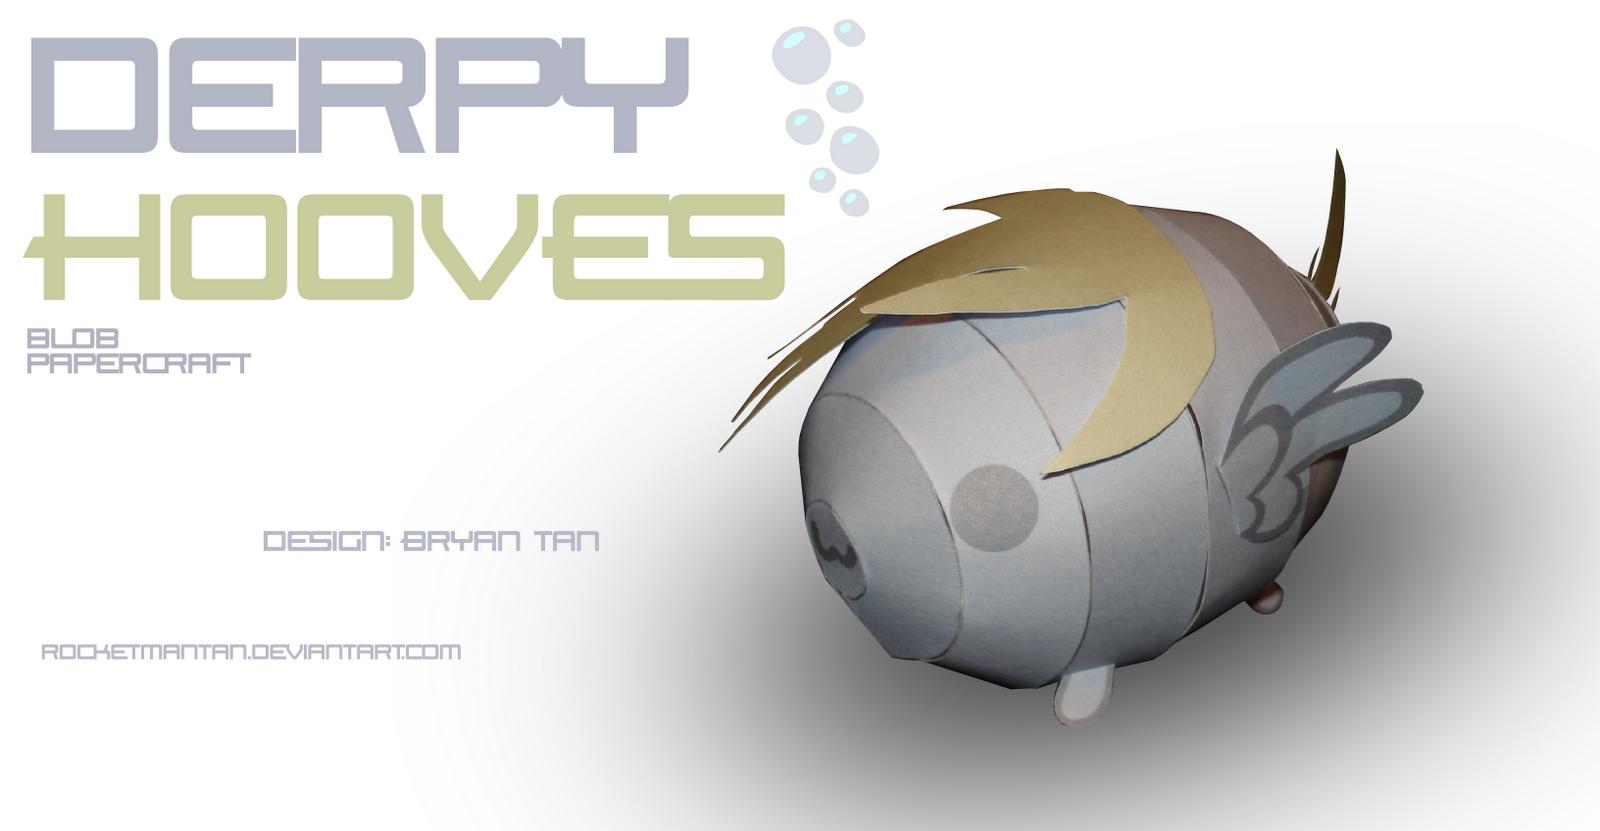 http://2.bp.blogspot.com/-iz6OajUOCOI/T_l3FHggF8I/AAAAAAAAMvI/oRtFKXvv1g0/s1600/Derpy+Hooves+Blob+Pony+Papercraft.png